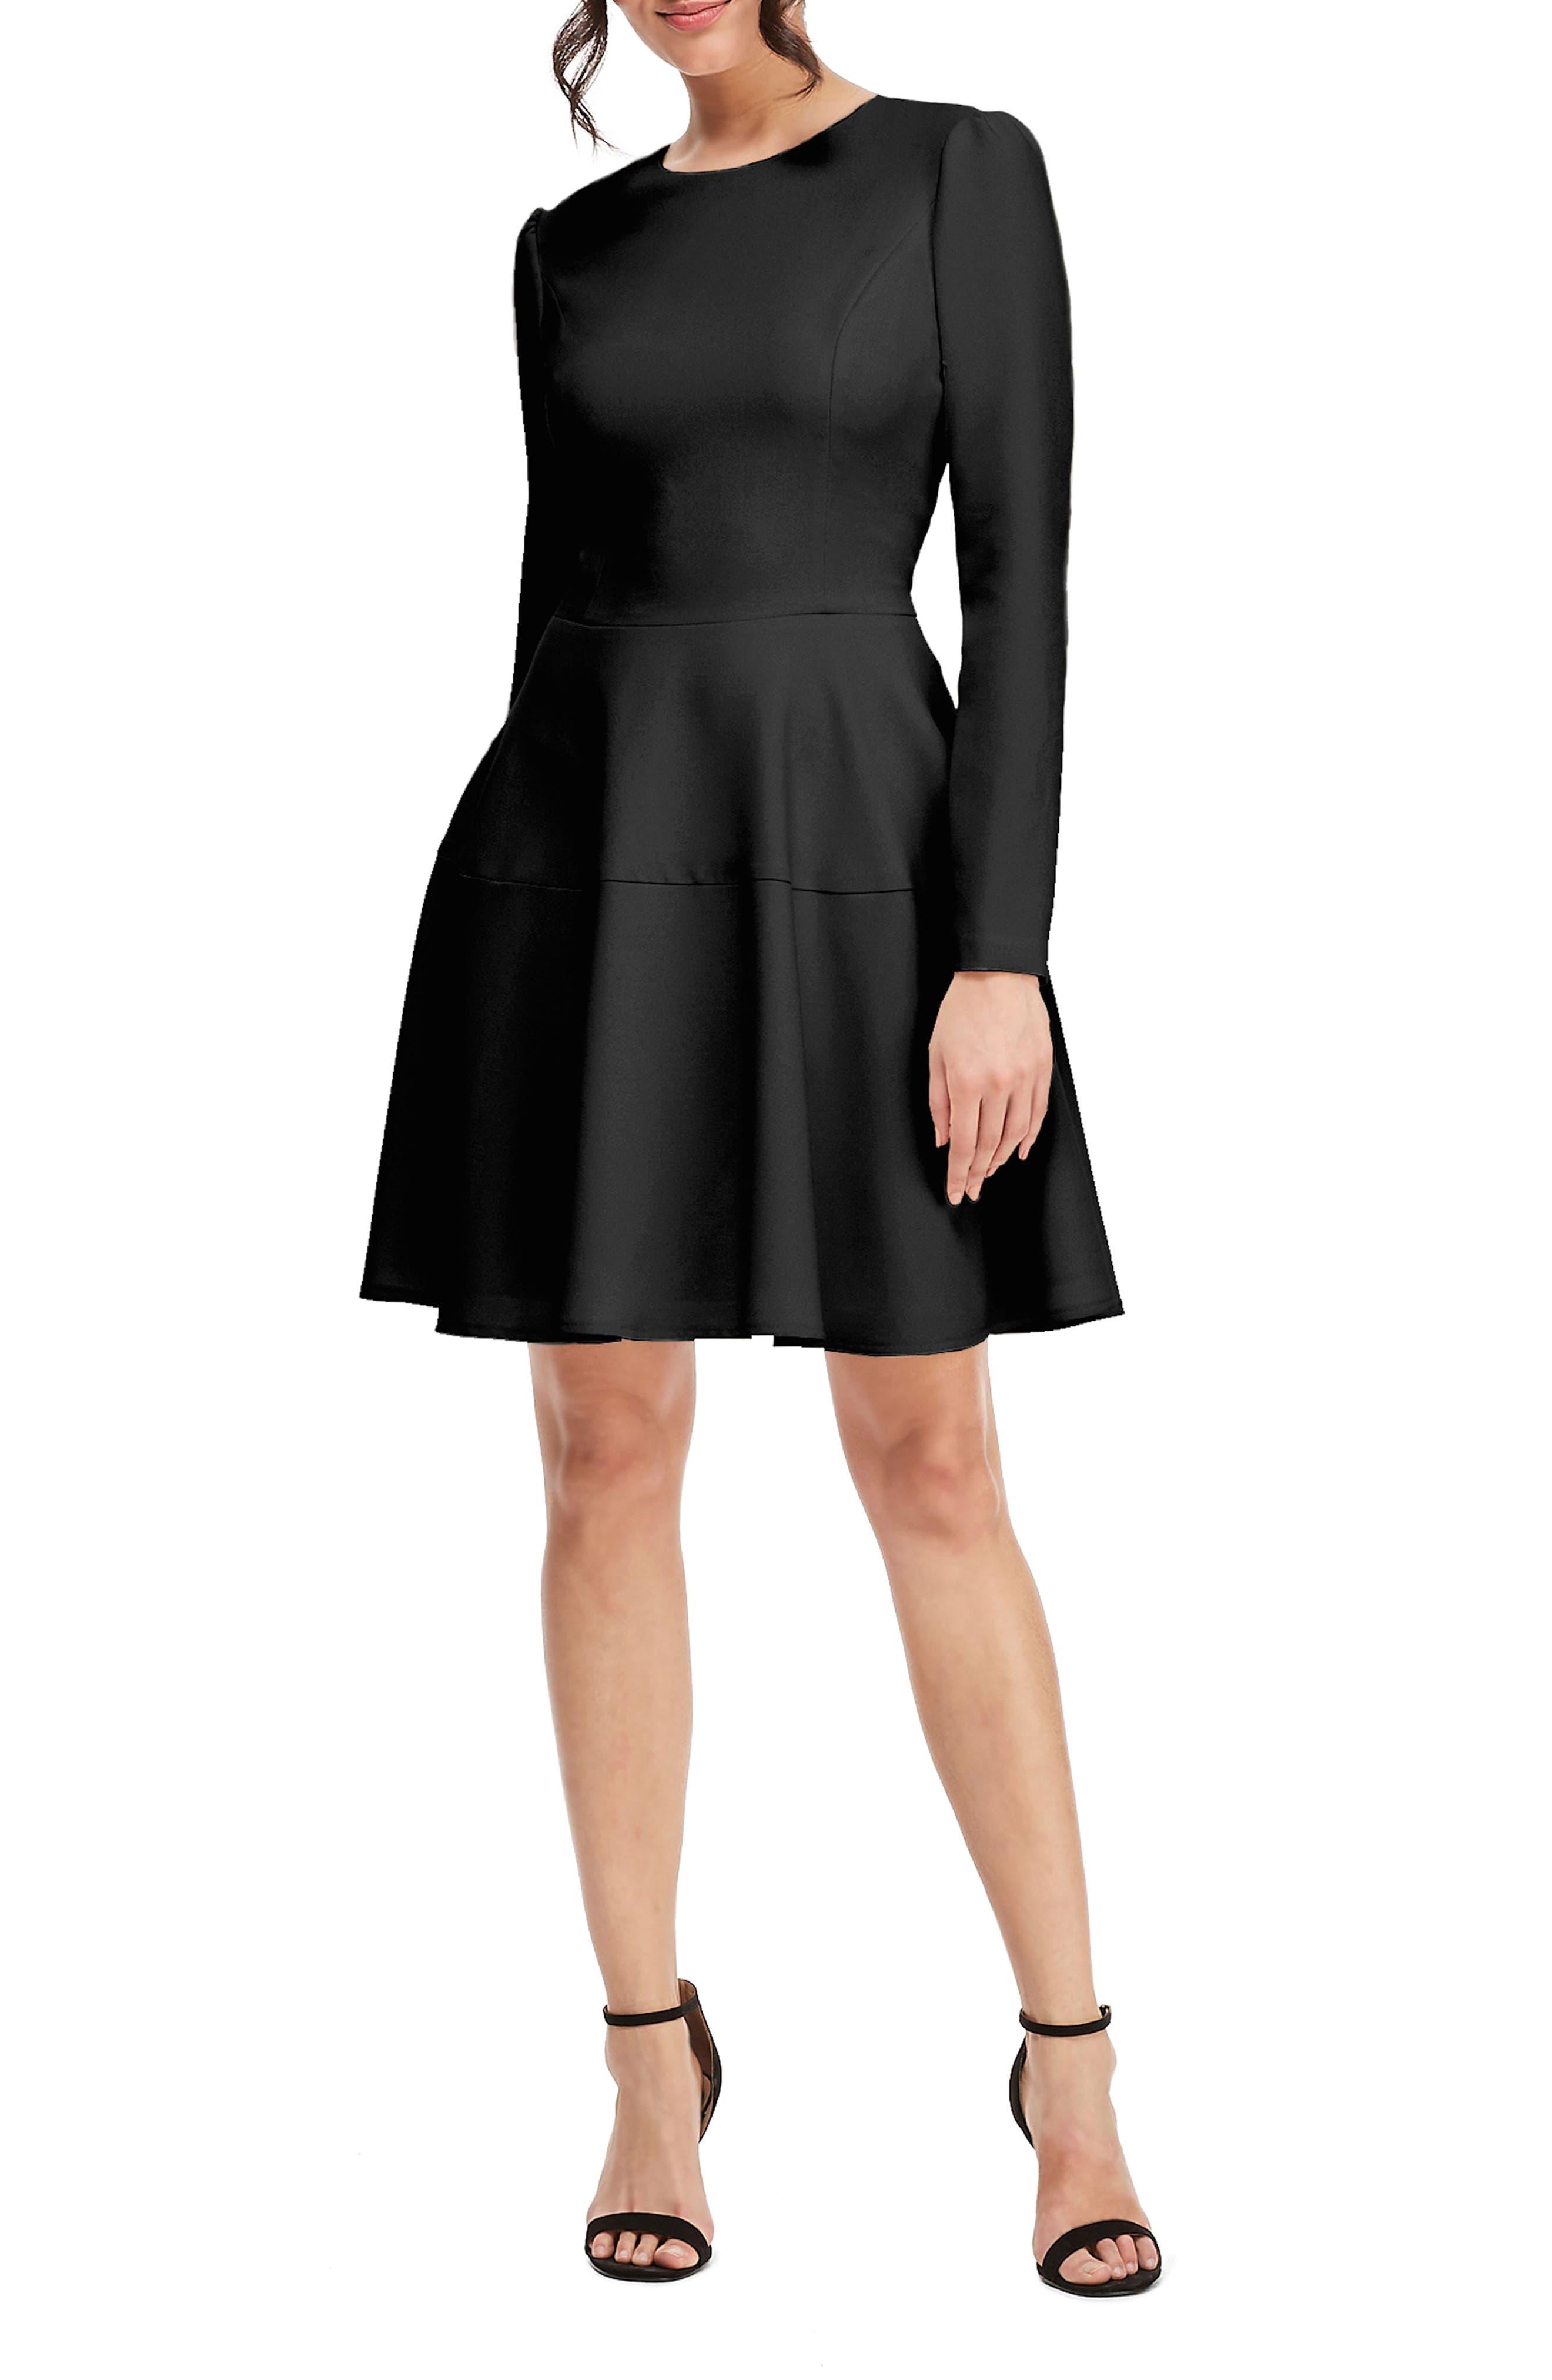 Celeste Fit & Flare Dress,                             Main thumbnail 1, color,                             BLACK